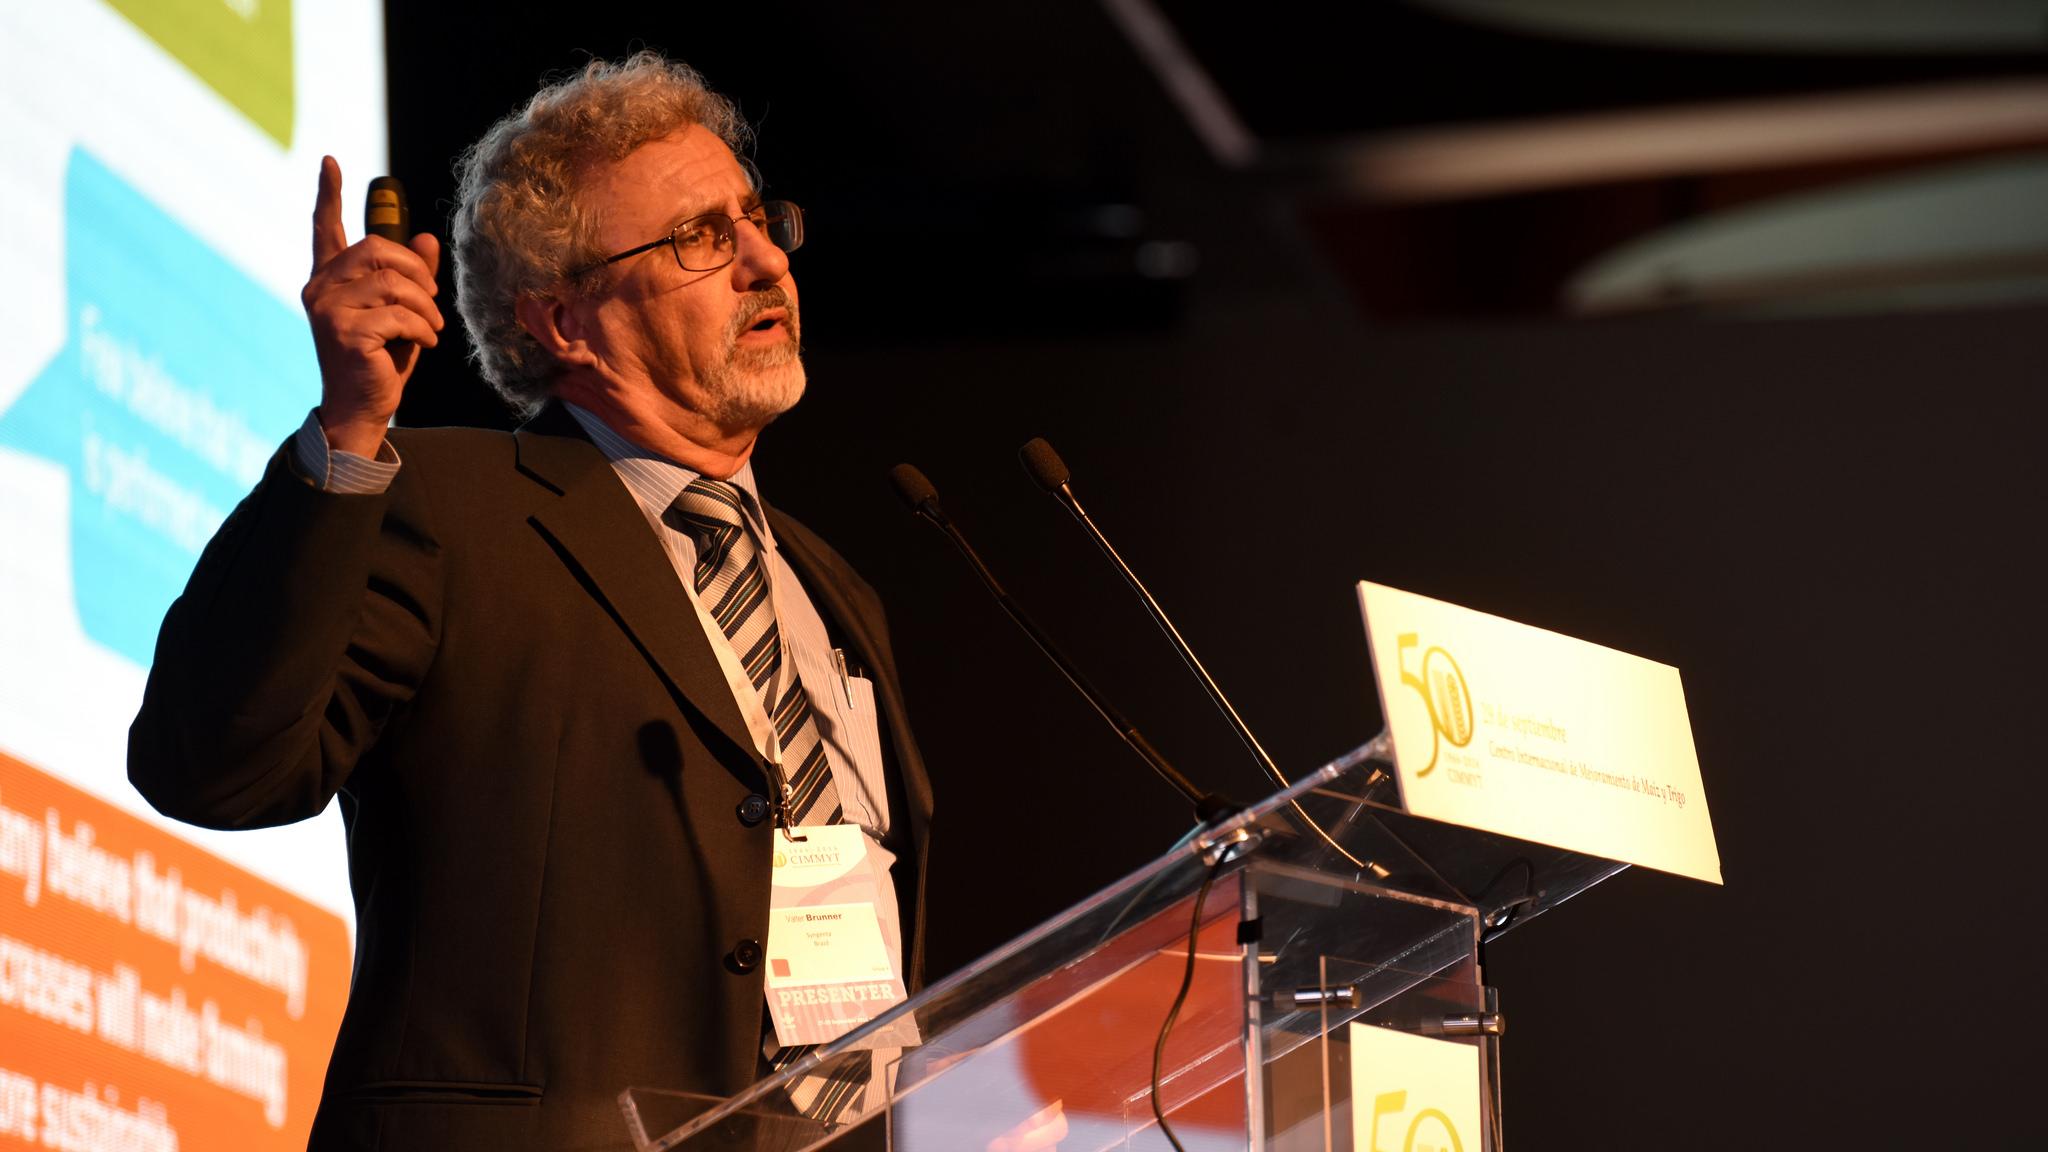 Valter Brunner, Syngenta's Corporate Affairs Director for Latin America. Photo: CIMMYT